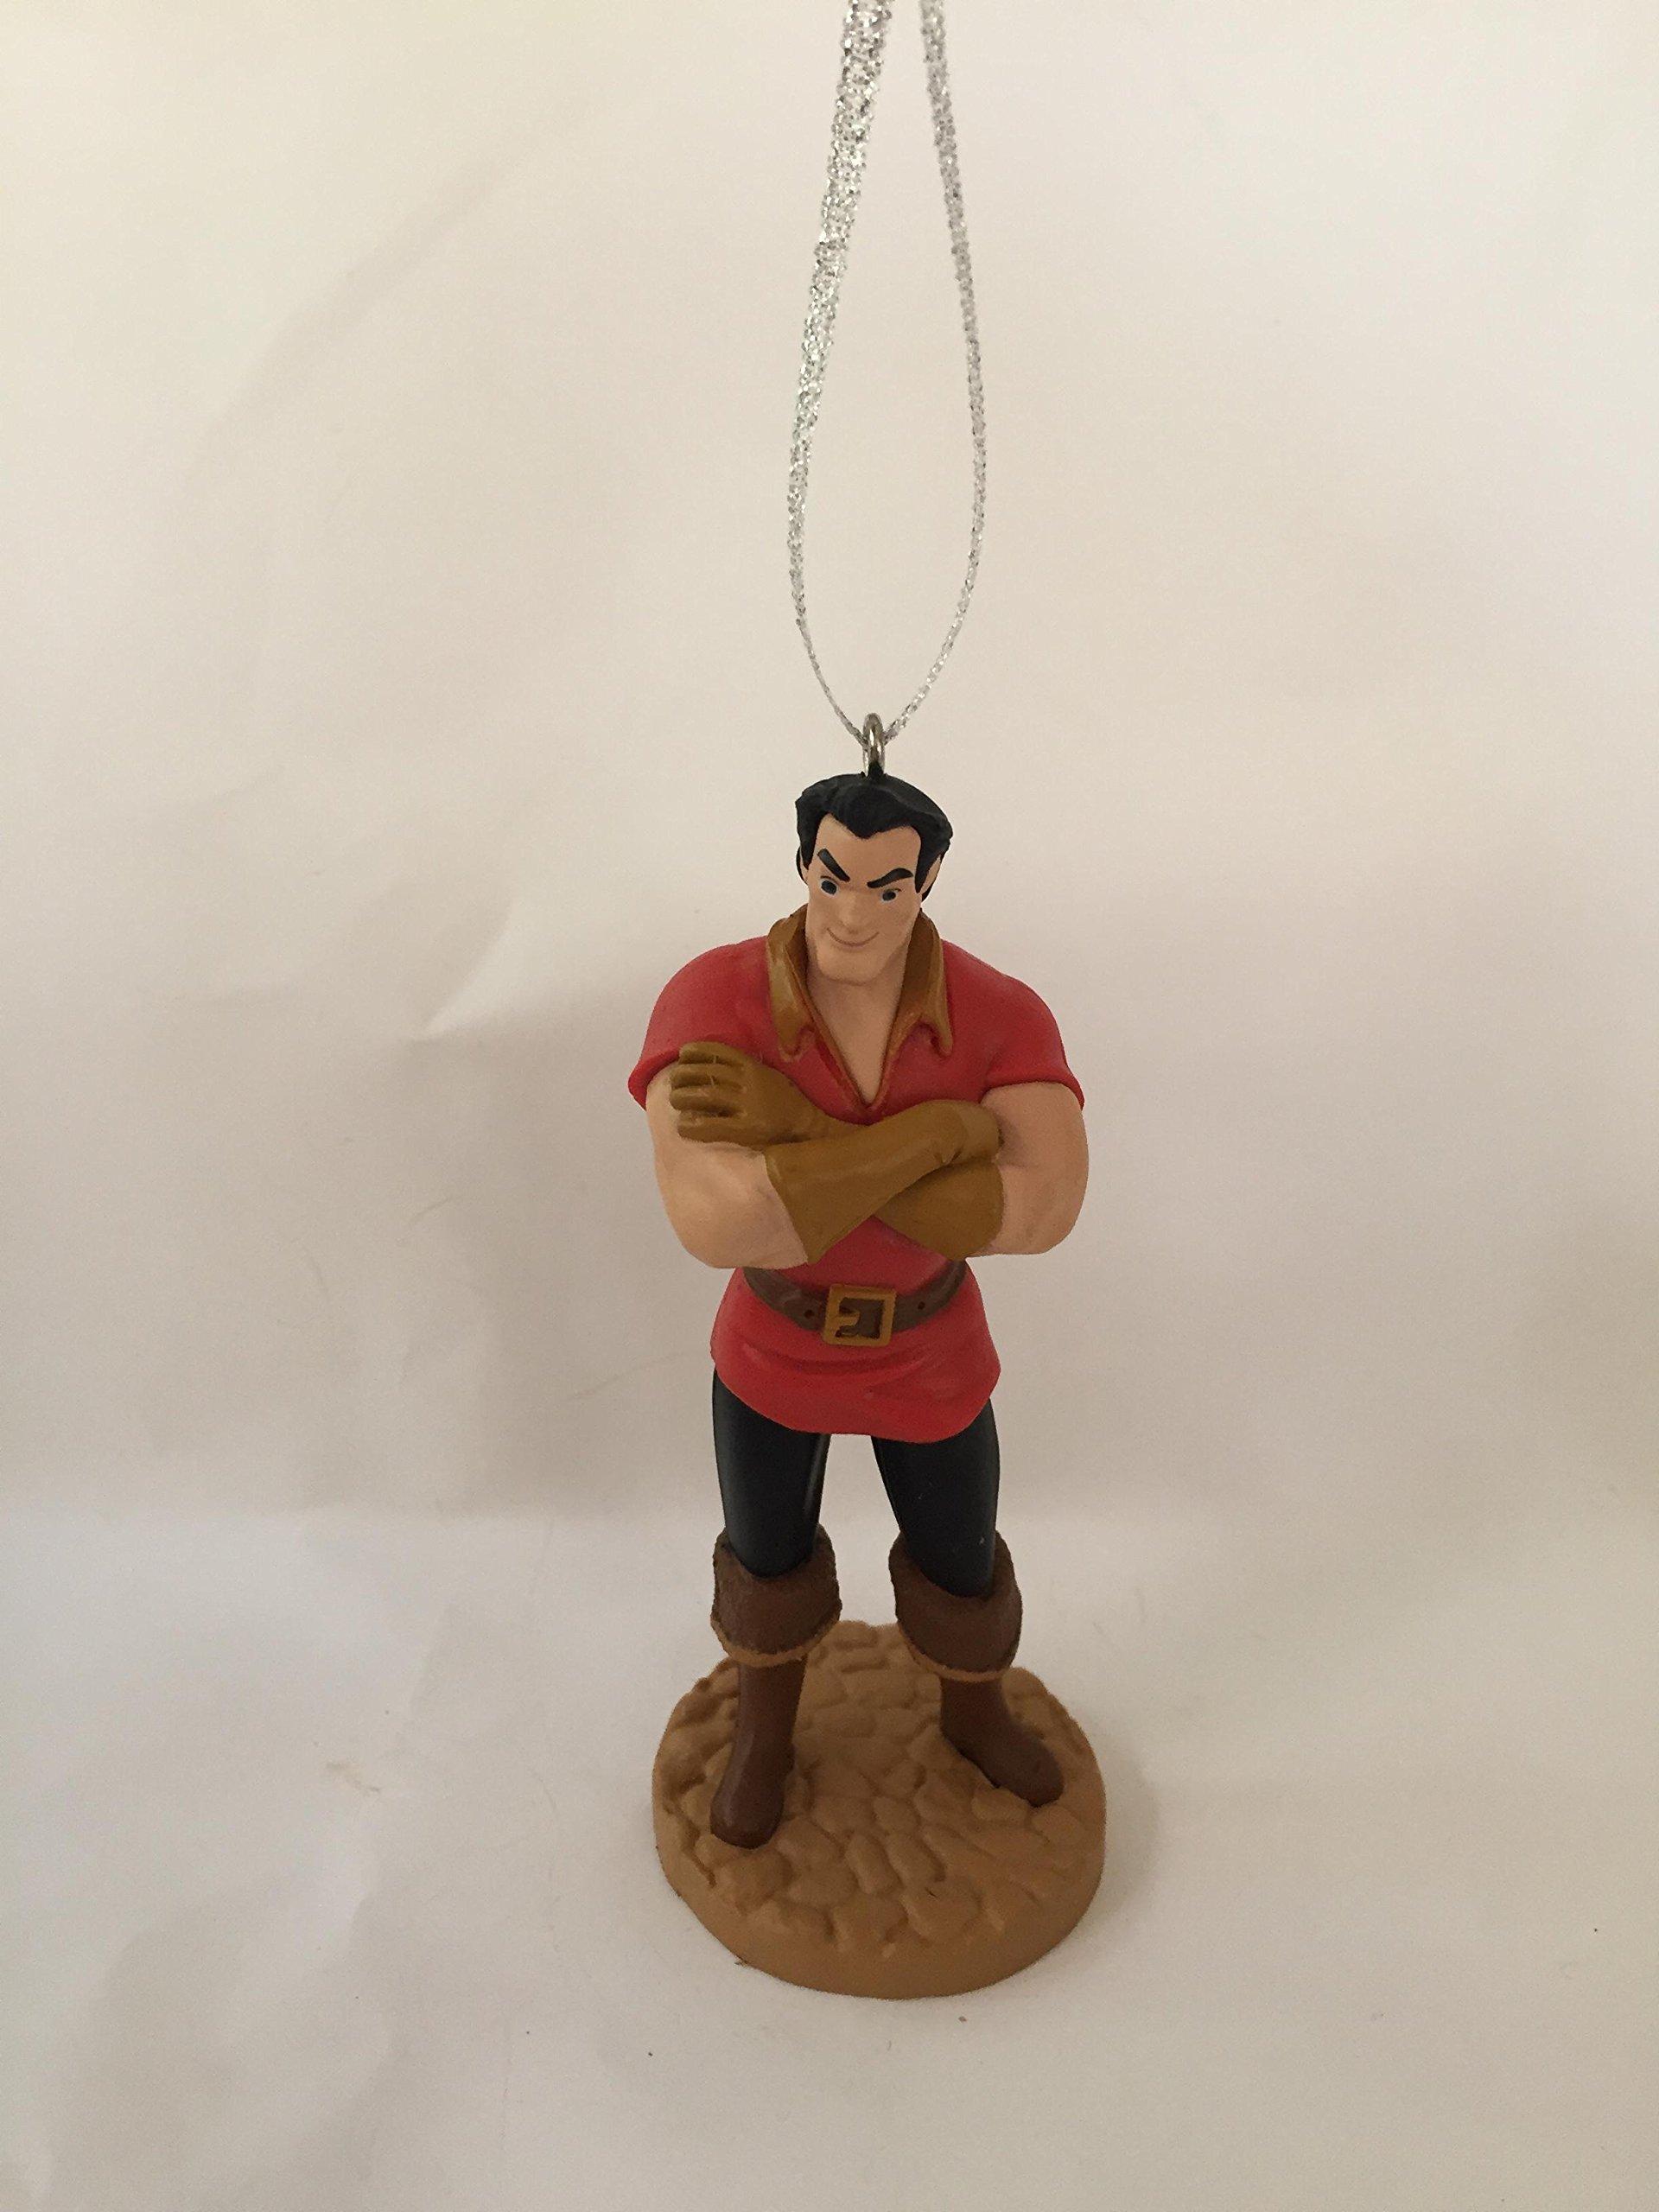 Disney Beauty and the Beast 4'' Gaston PVC Figure Holiday Christmas Tree Ornament Figurine Doll Toy